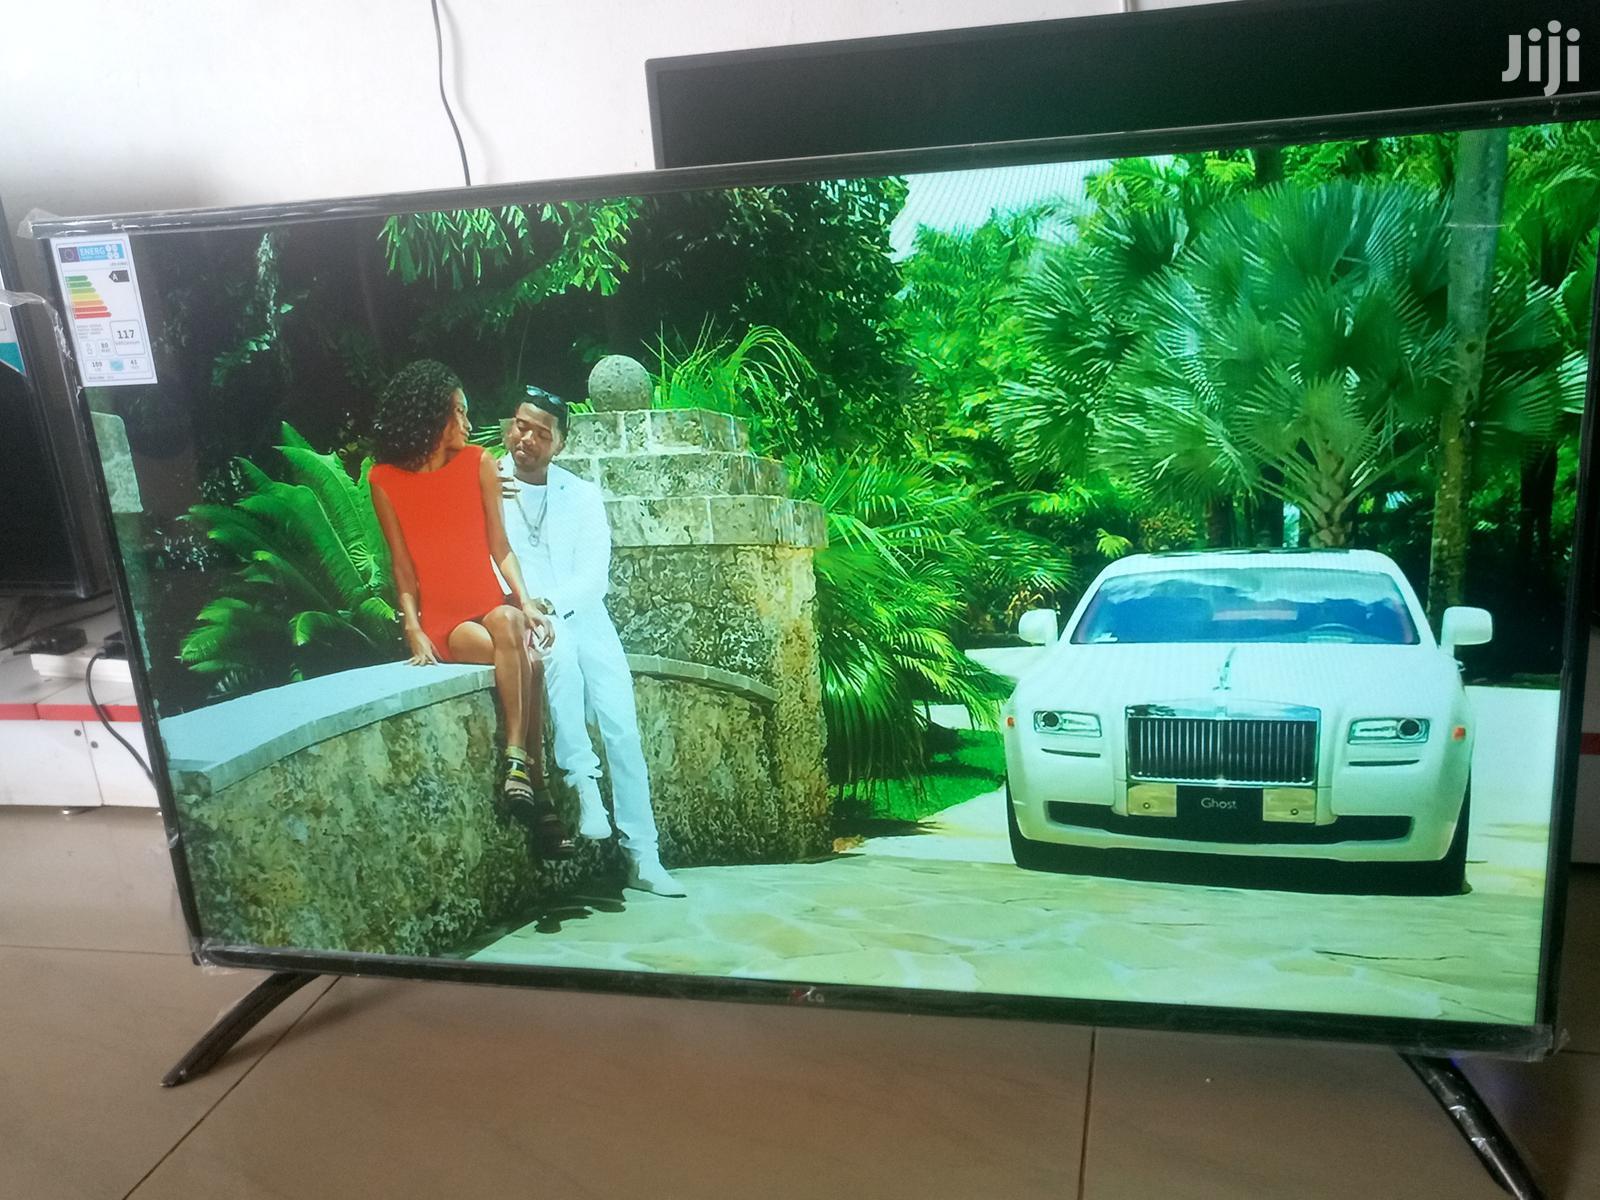 LG LED Flat Screen Digital TV 43 Inches | TV & DVD Equipment for sale in Kampala, Central Region, Uganda